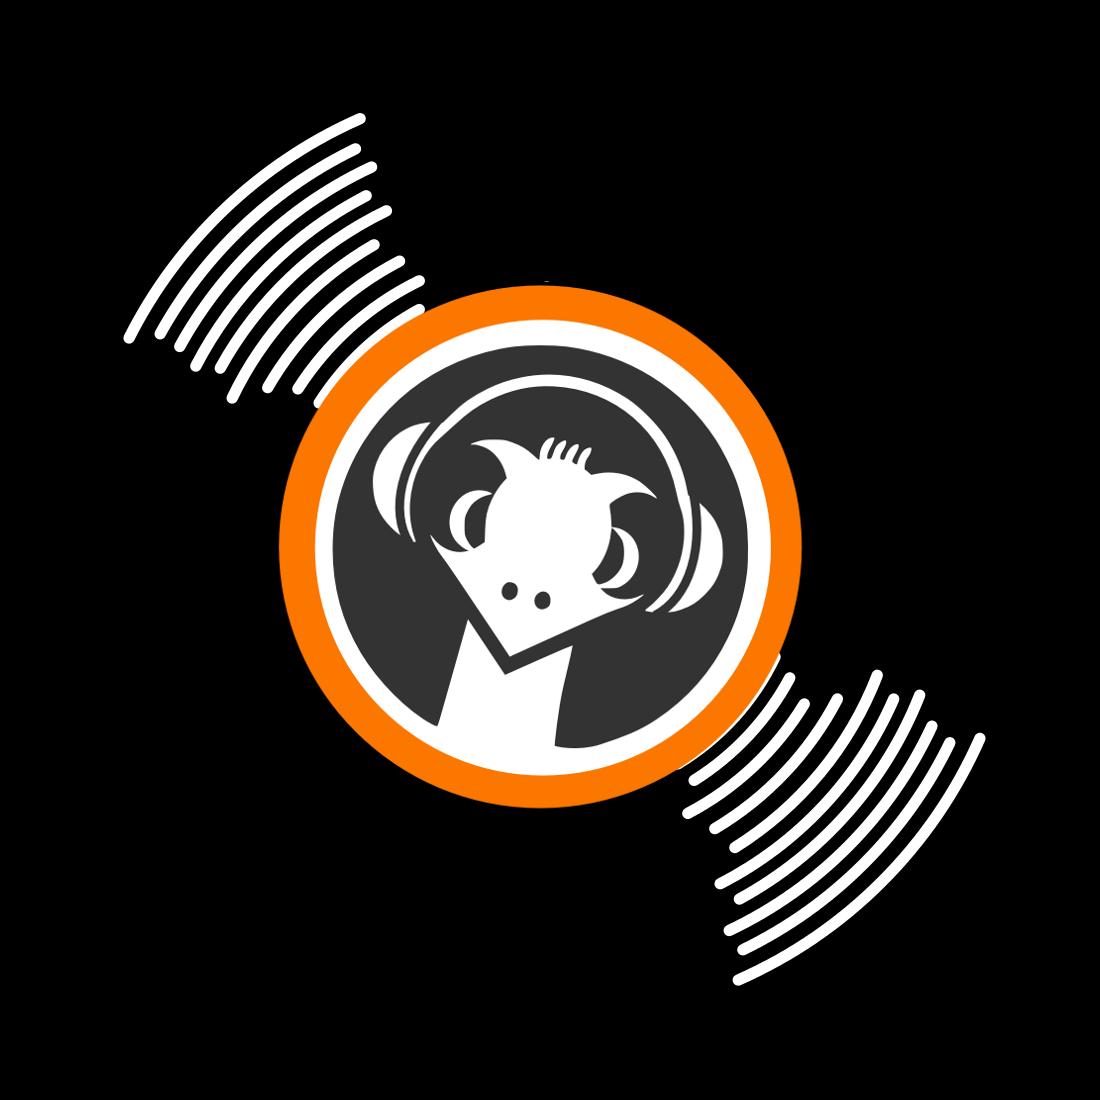 [Die Intellektronische Biparietal Projekt] L'albinos et le catadioptre